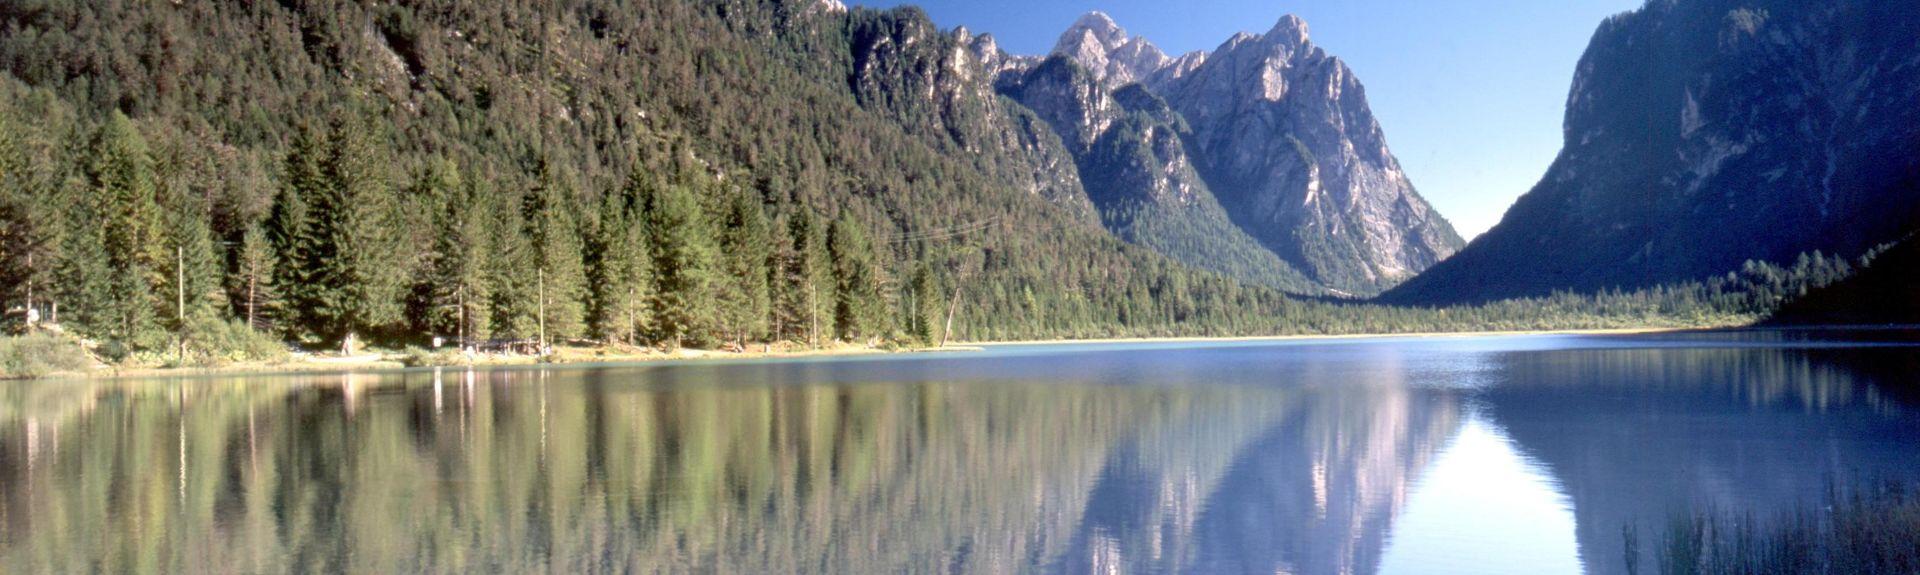 Lake Braies, Braies, Trentino-Alto Adige, Italy